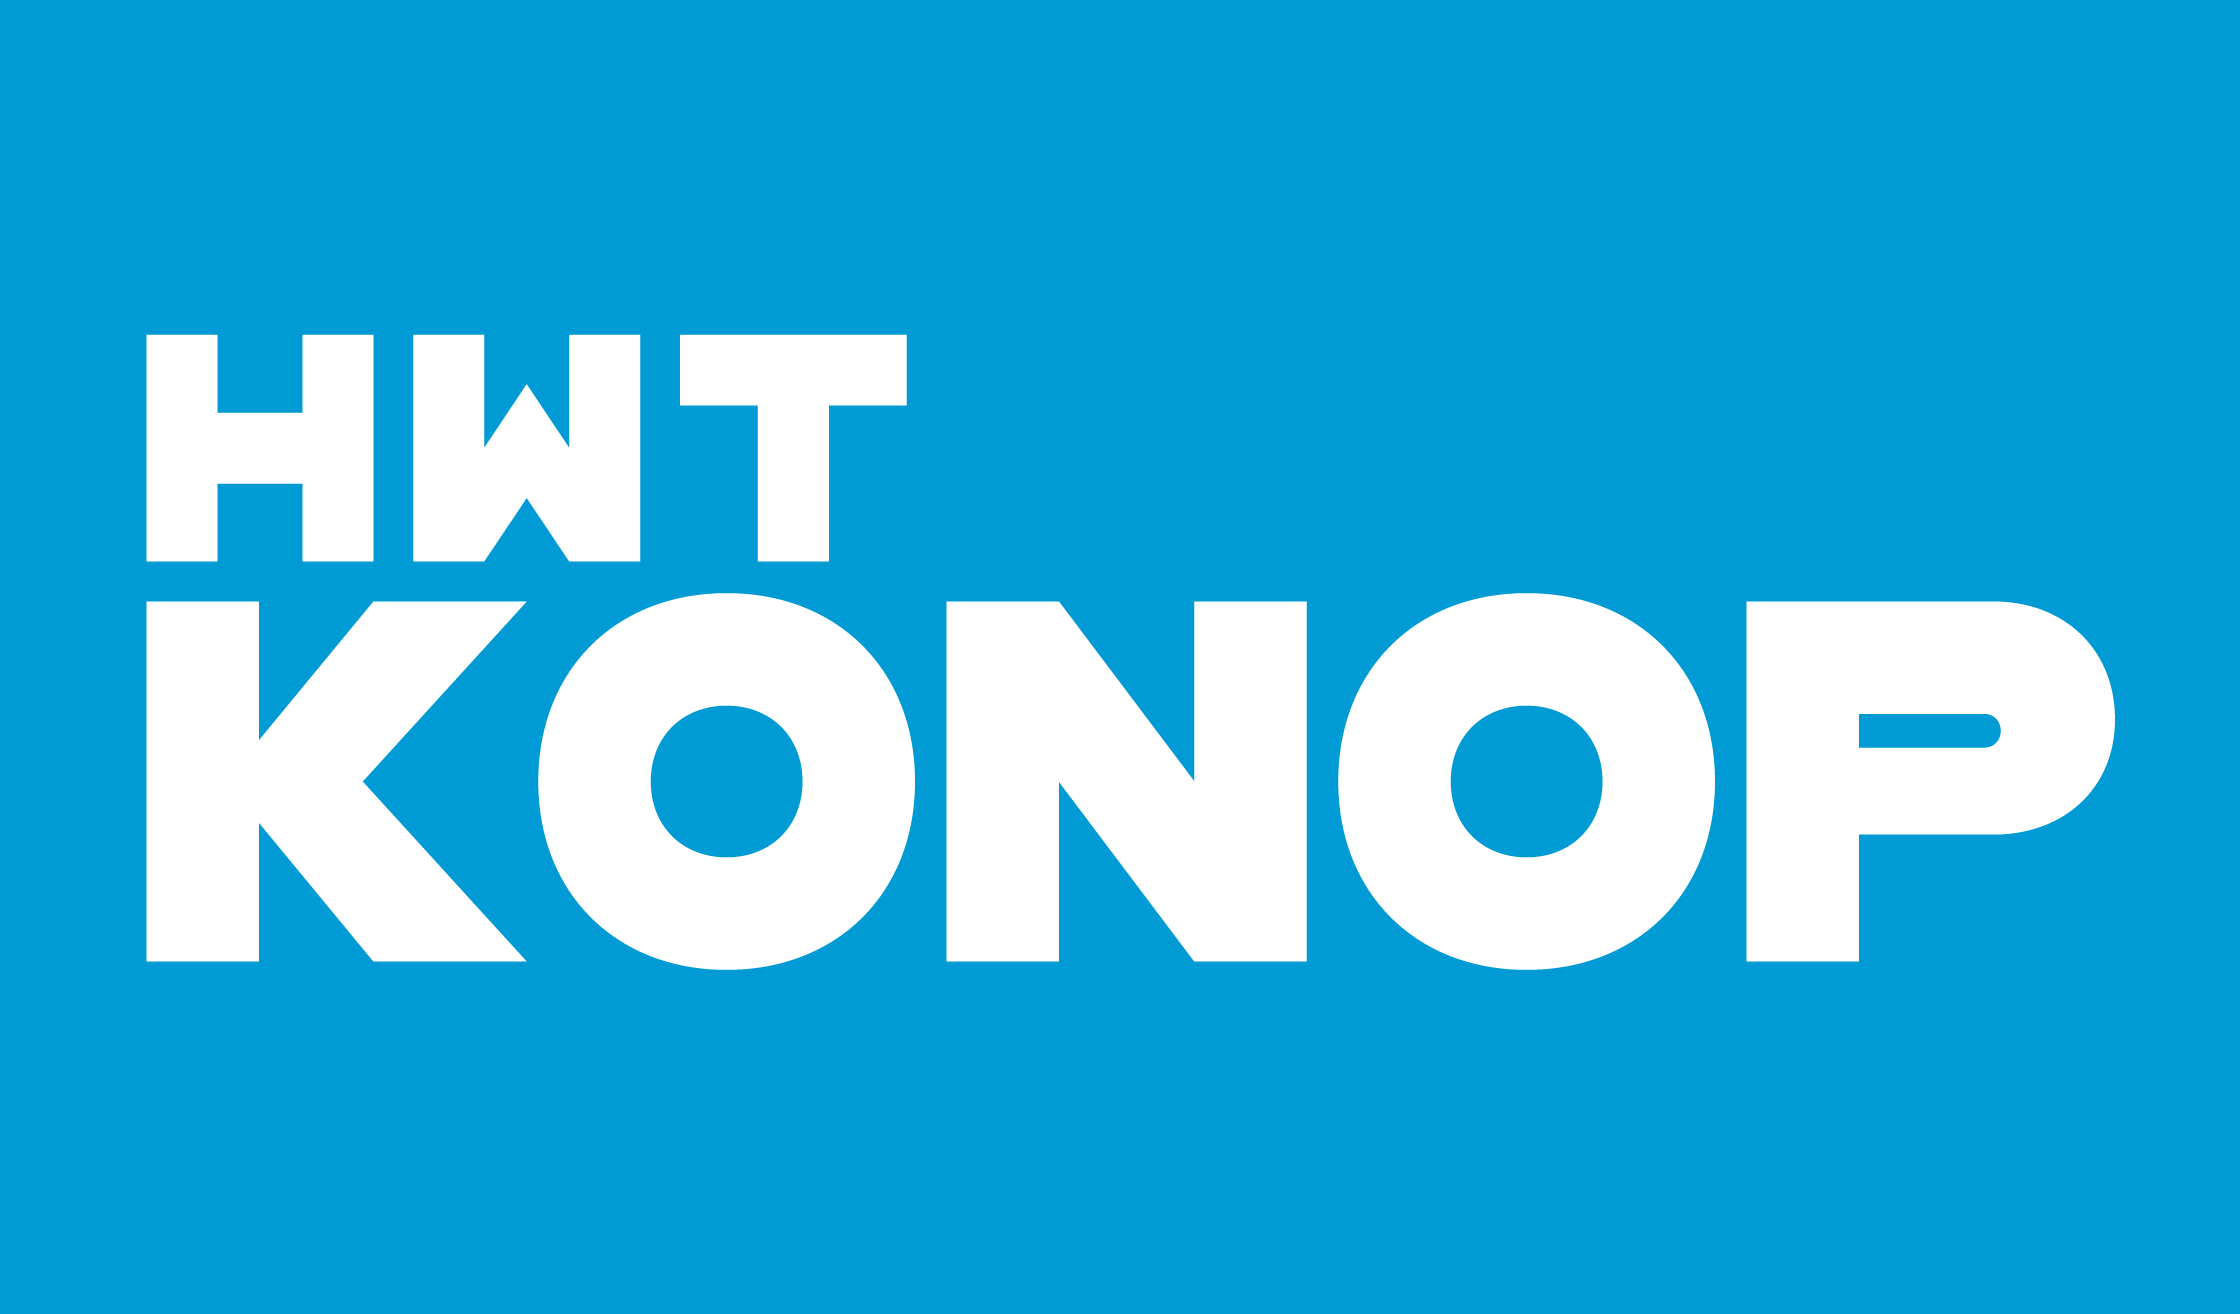 Konop Banner Name 2240